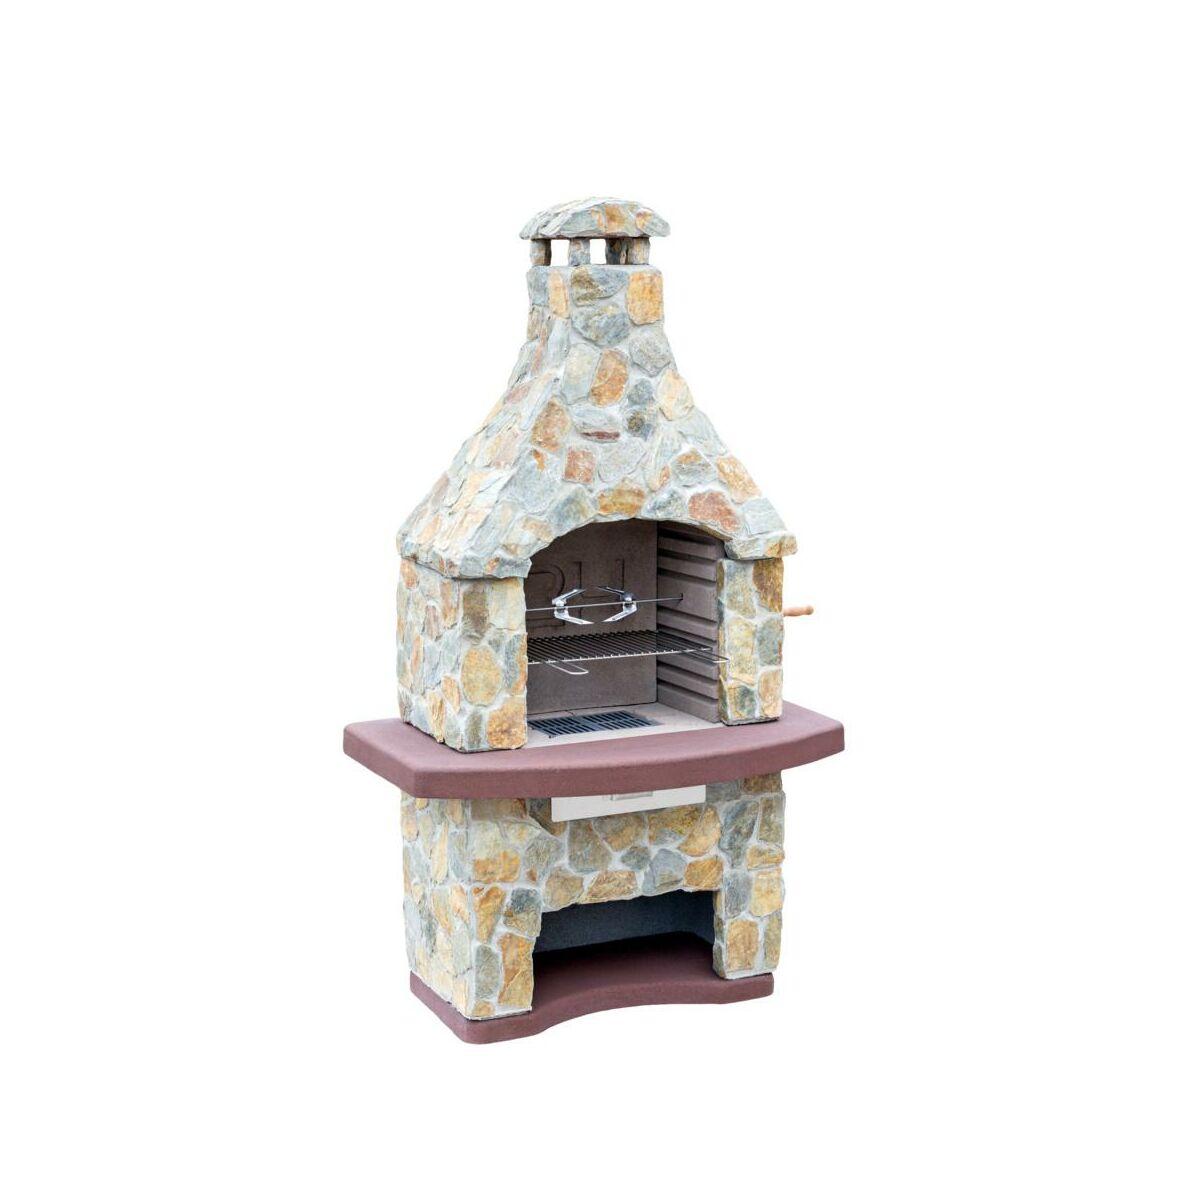 grill betonowy musalla upek b k grille betonowe w atrakcyjnej cenie w sklepach leroy merlin. Black Bedroom Furniture Sets. Home Design Ideas